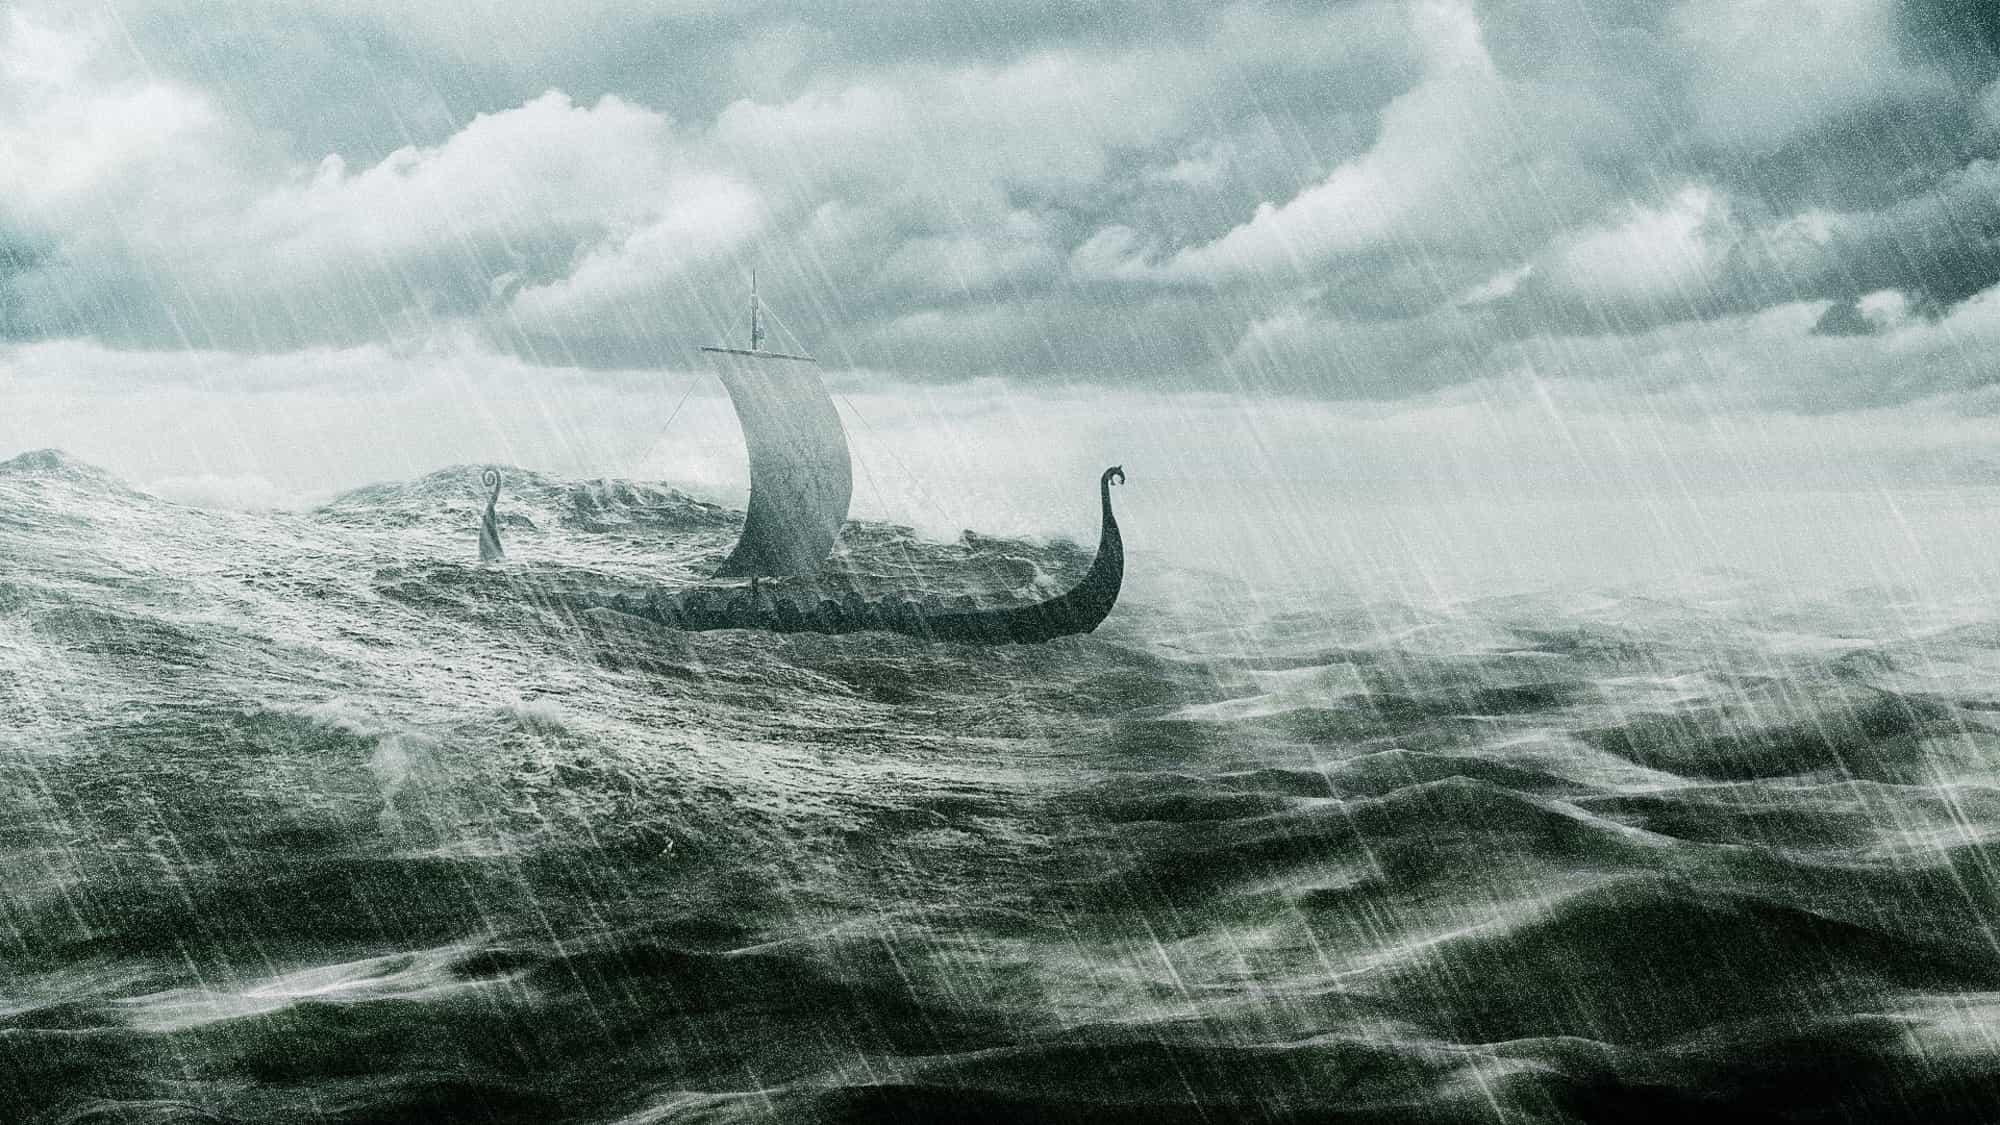 Viking Ship Digital Art Omnislash Visual